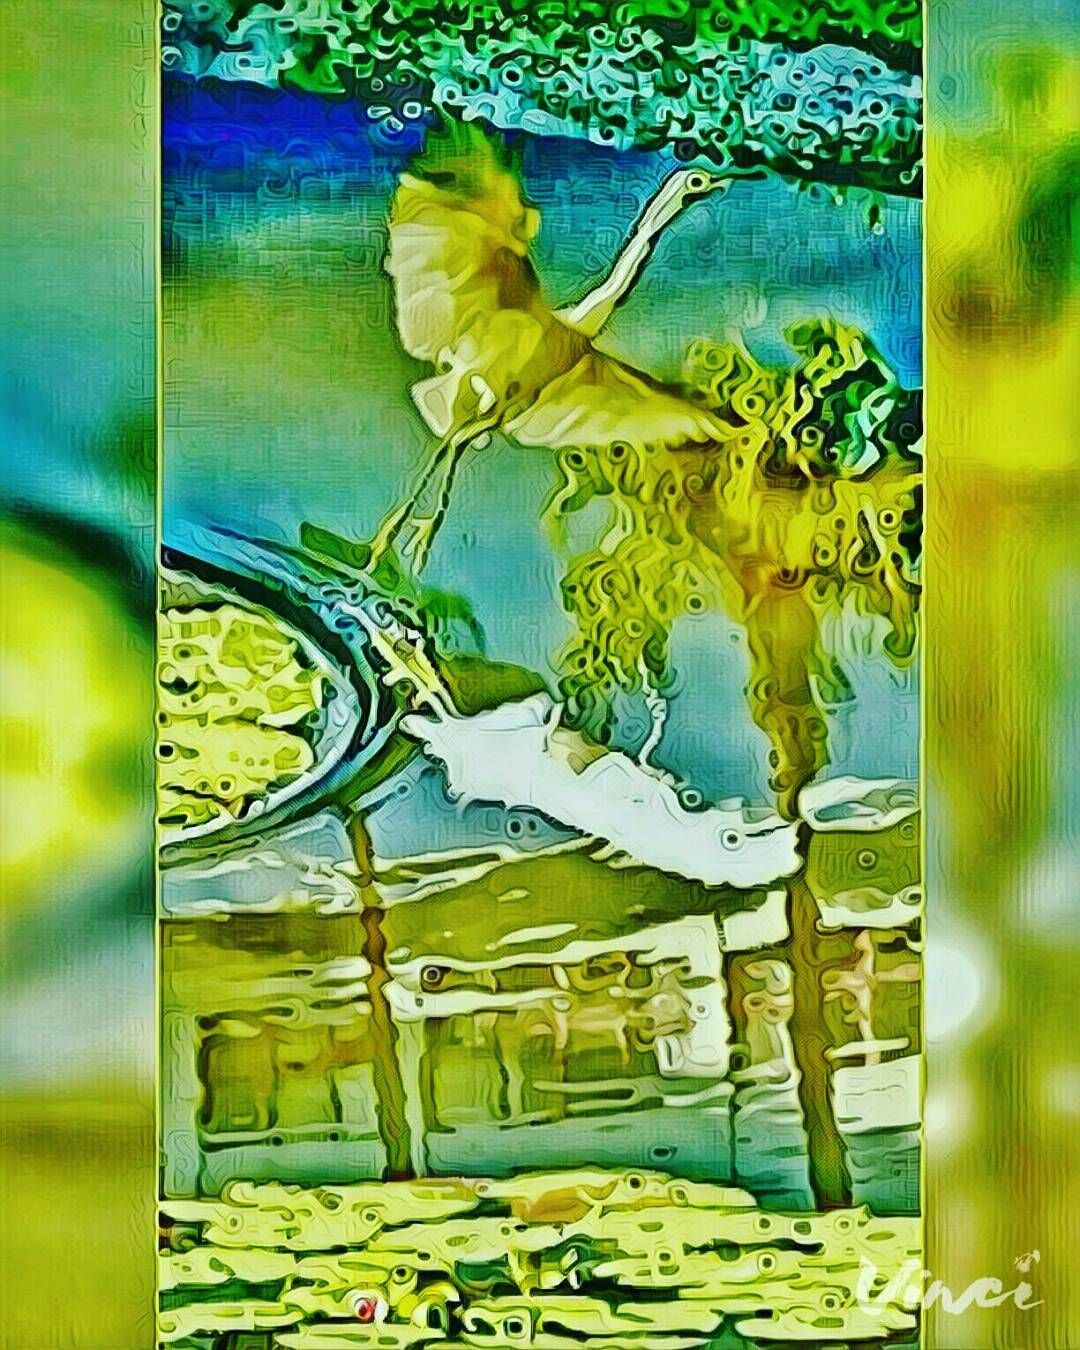 "💝 Lovely Egret 🐦~"" # Reflection # MaxEditing # Egret #VideoShots 🎨🌈 *#Binary @Vinci.cam ~ x 41*+%+Sizes Trendy Filters for quick photo Editing using Artificial Intelligence. #Vinci #Art175Now #VinciApp #VinciEffects #Vinci_Show"